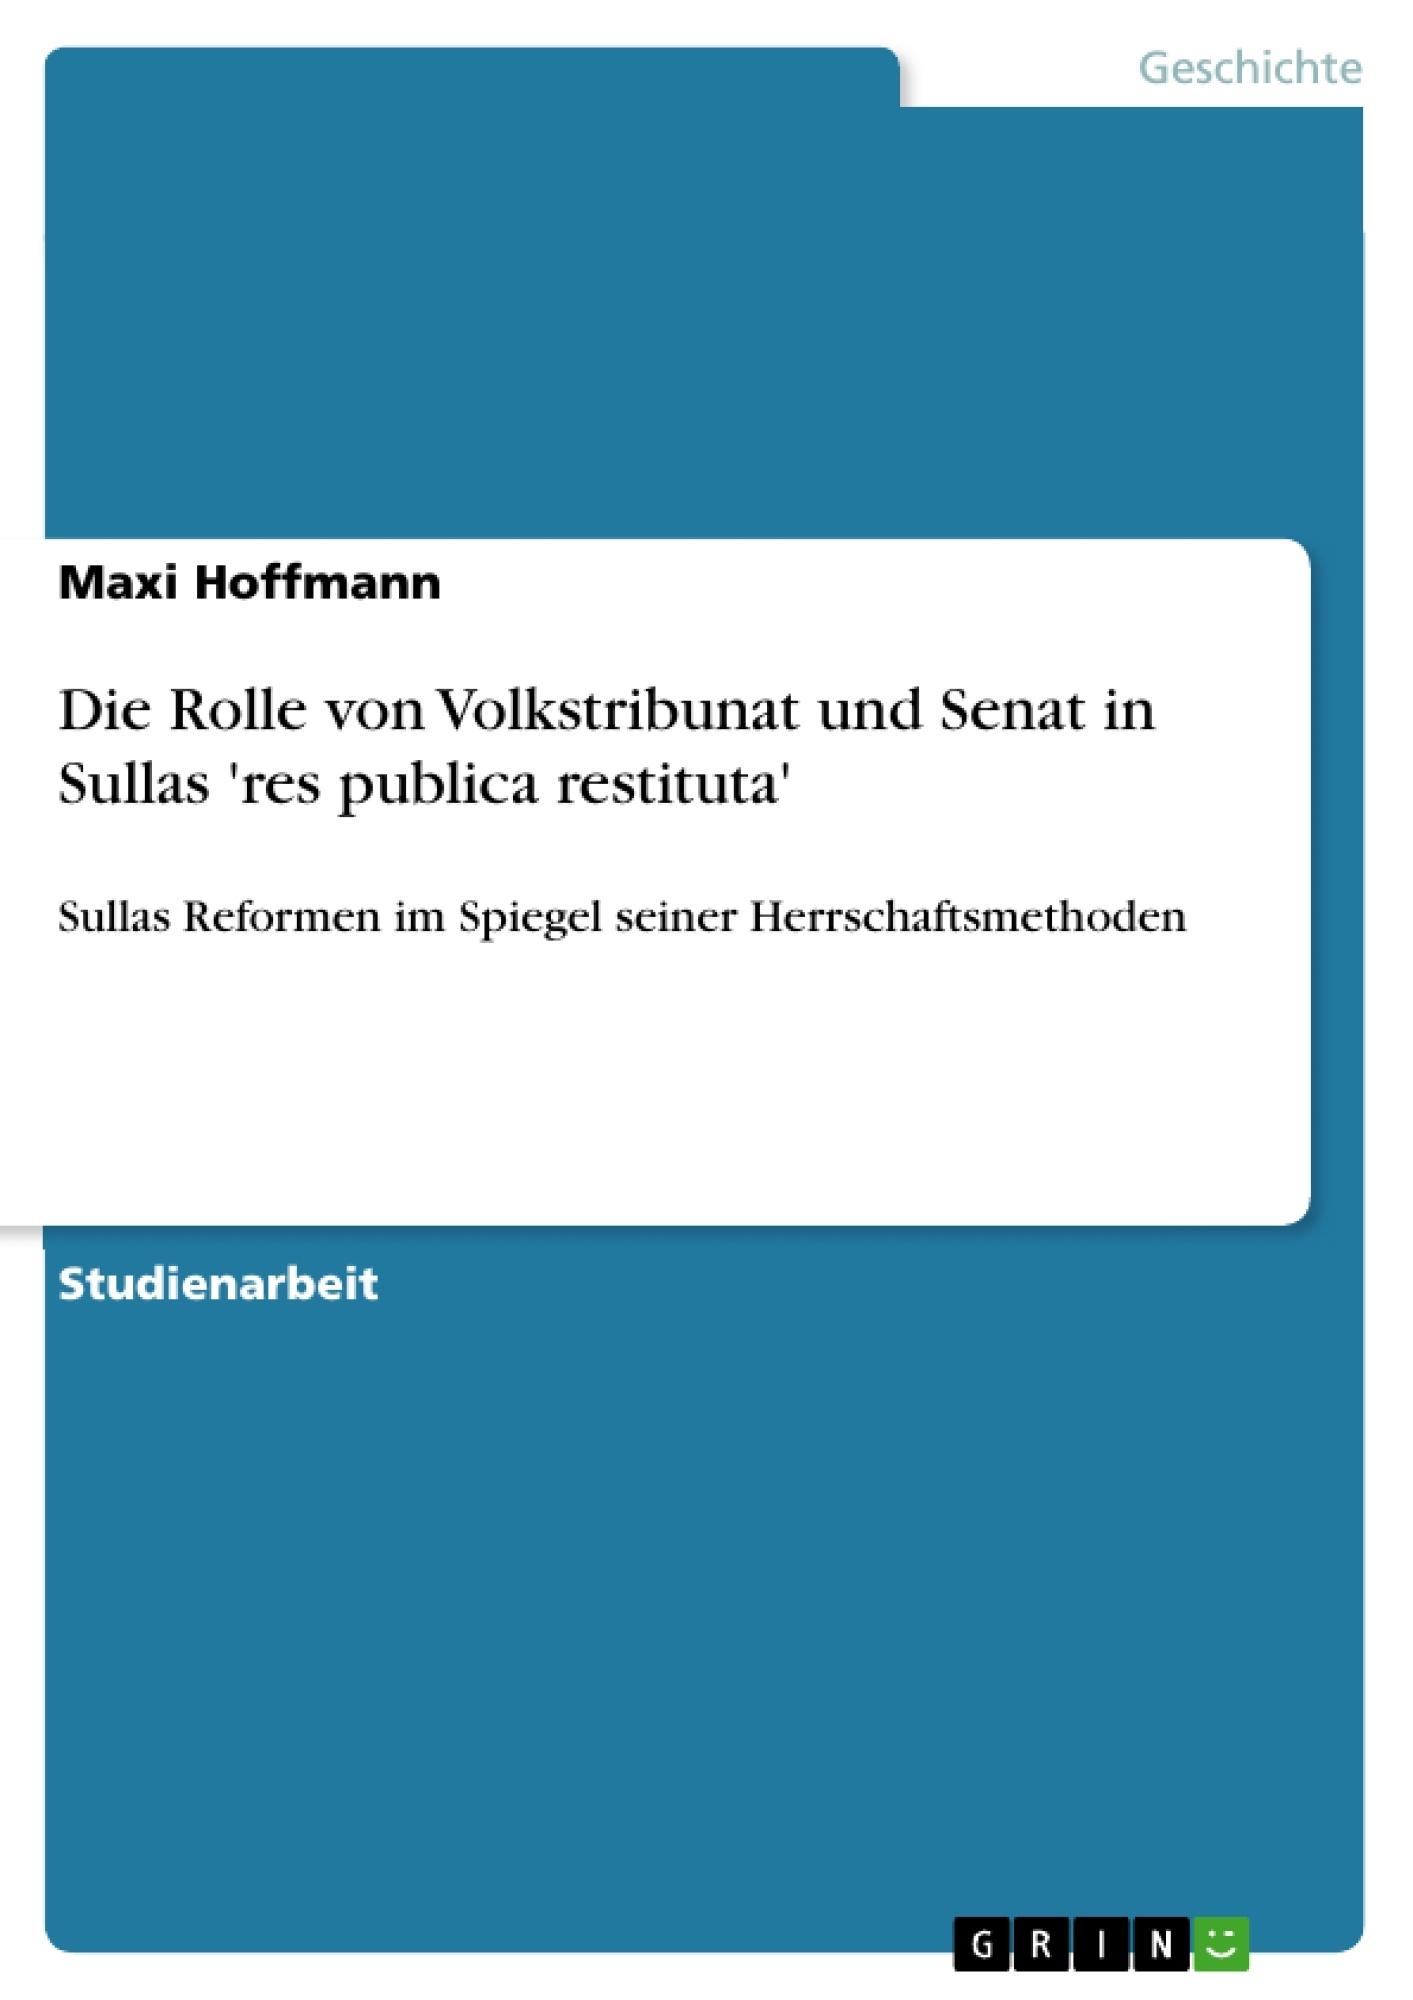 Titel: Die Rolle von Volkstribunat und Senat in Sullas 'res publica restituta'